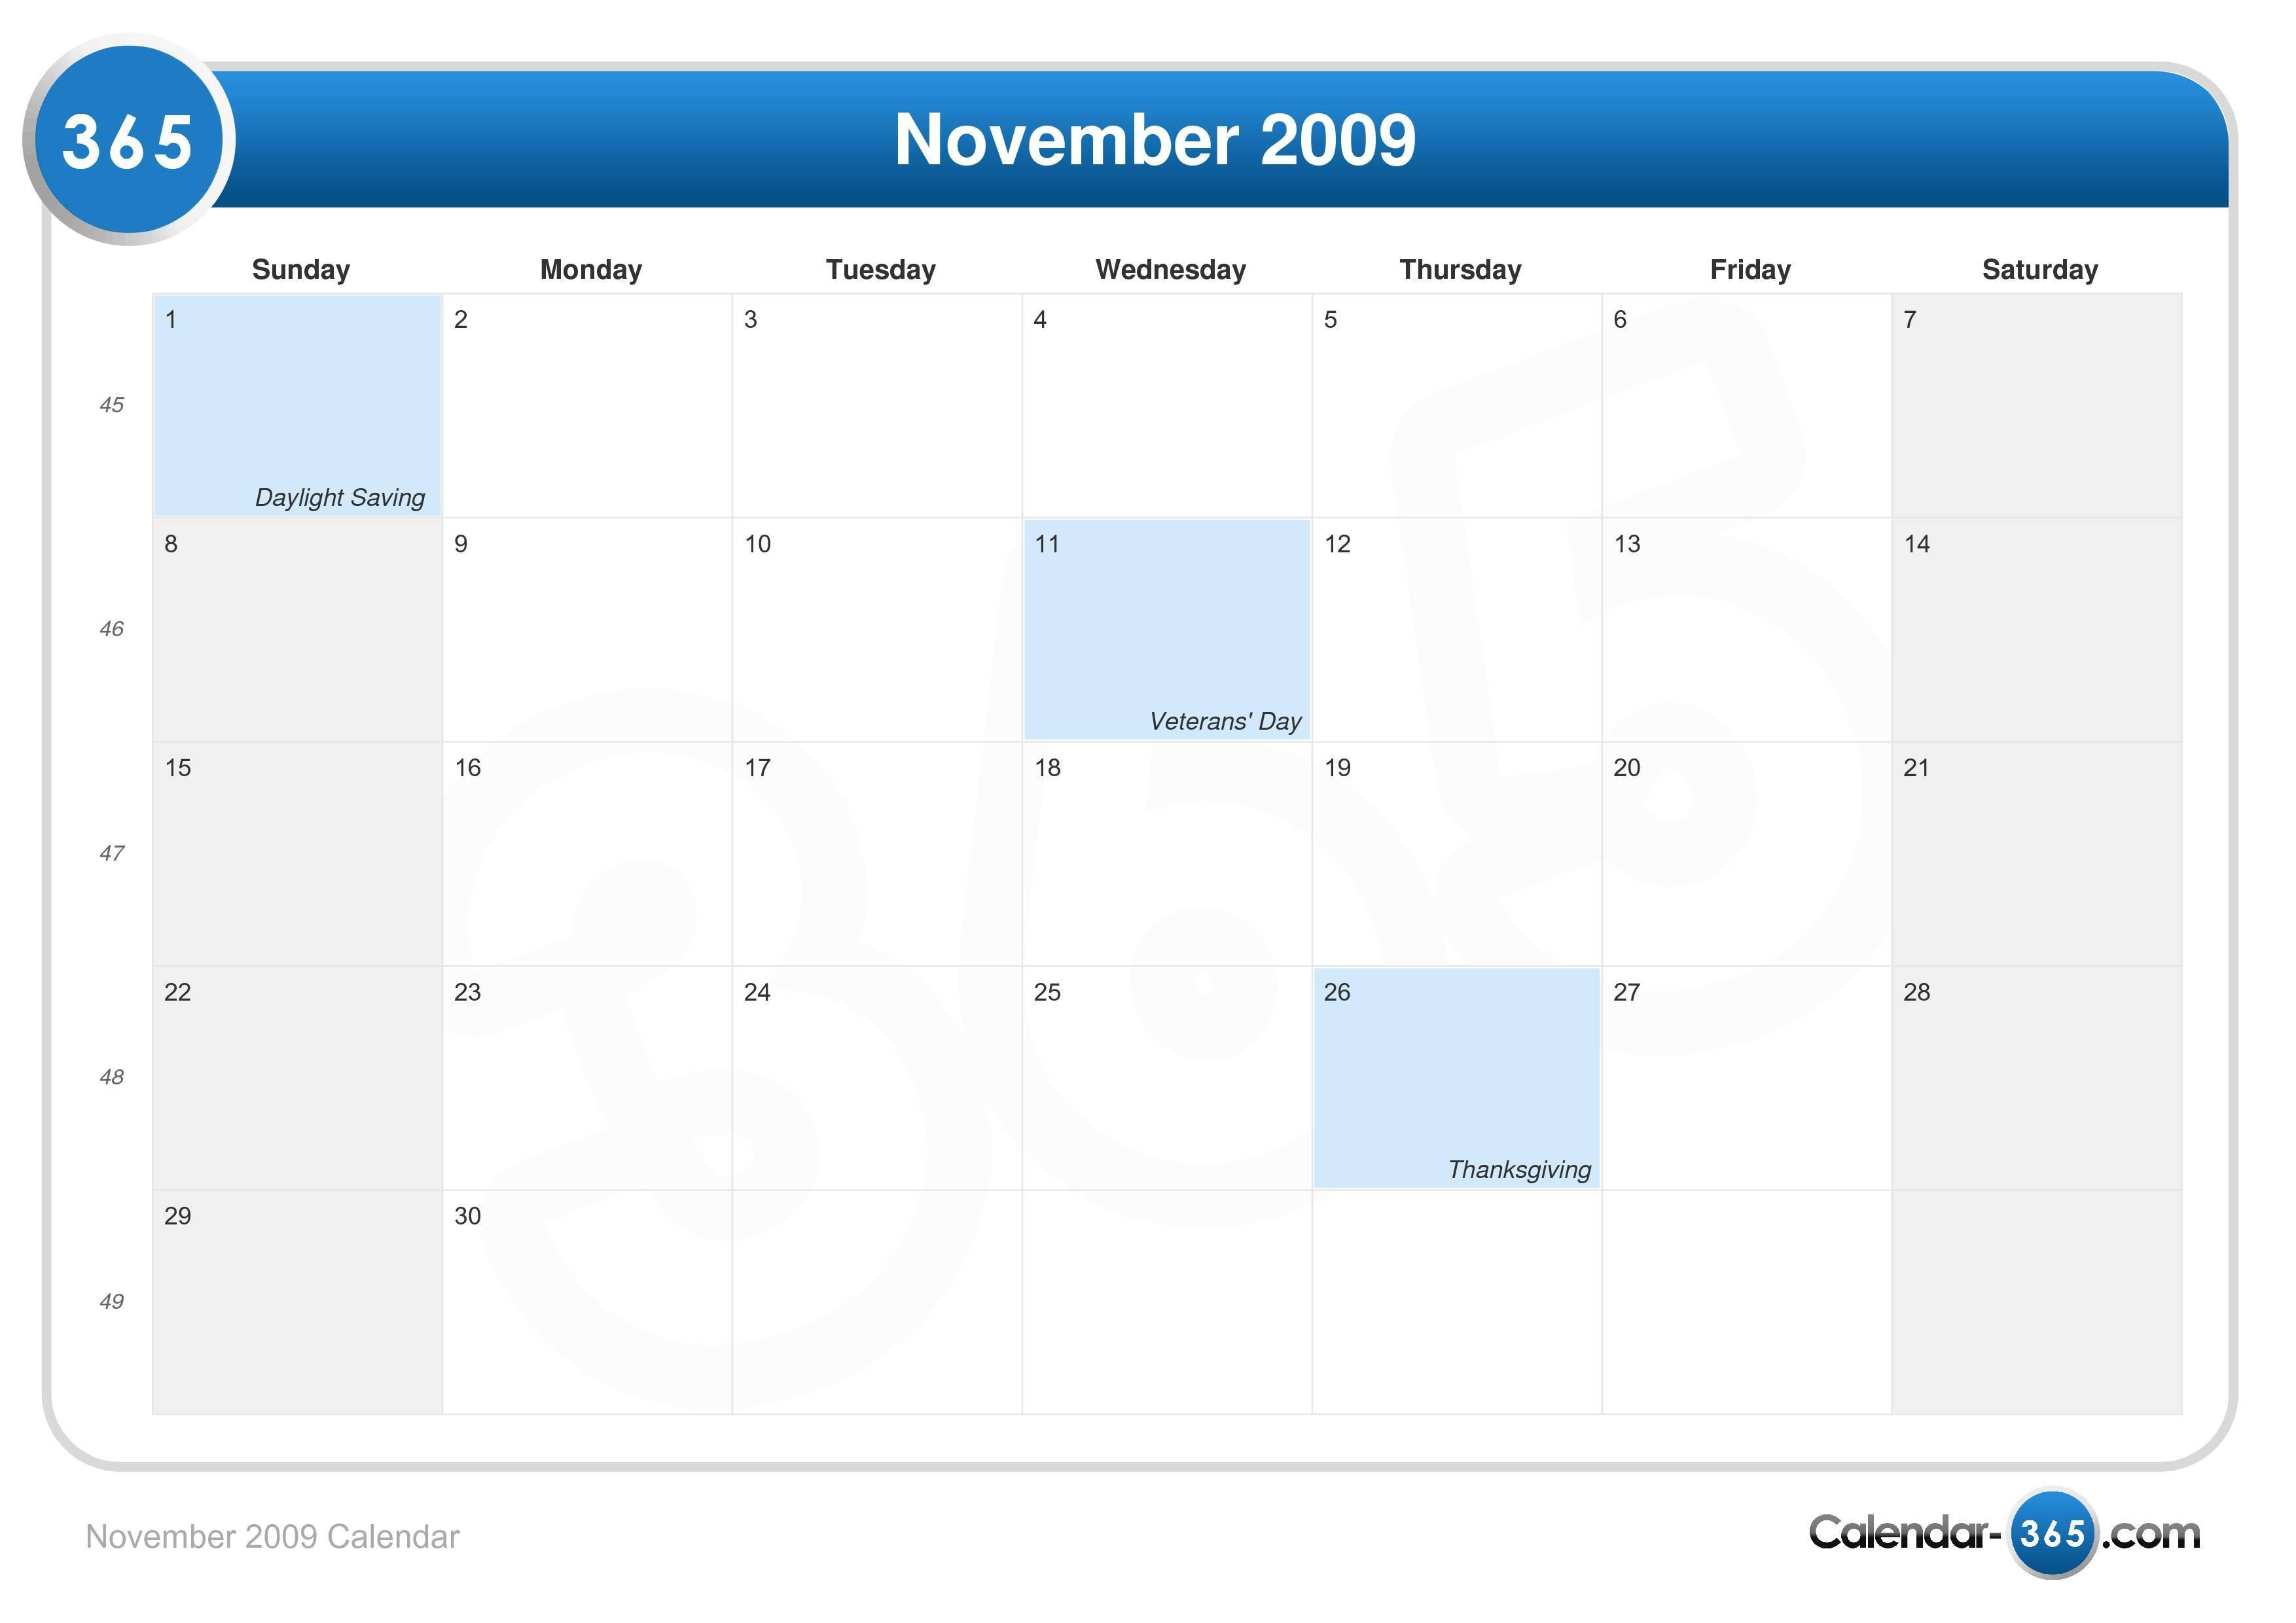 November 2009 Calendar